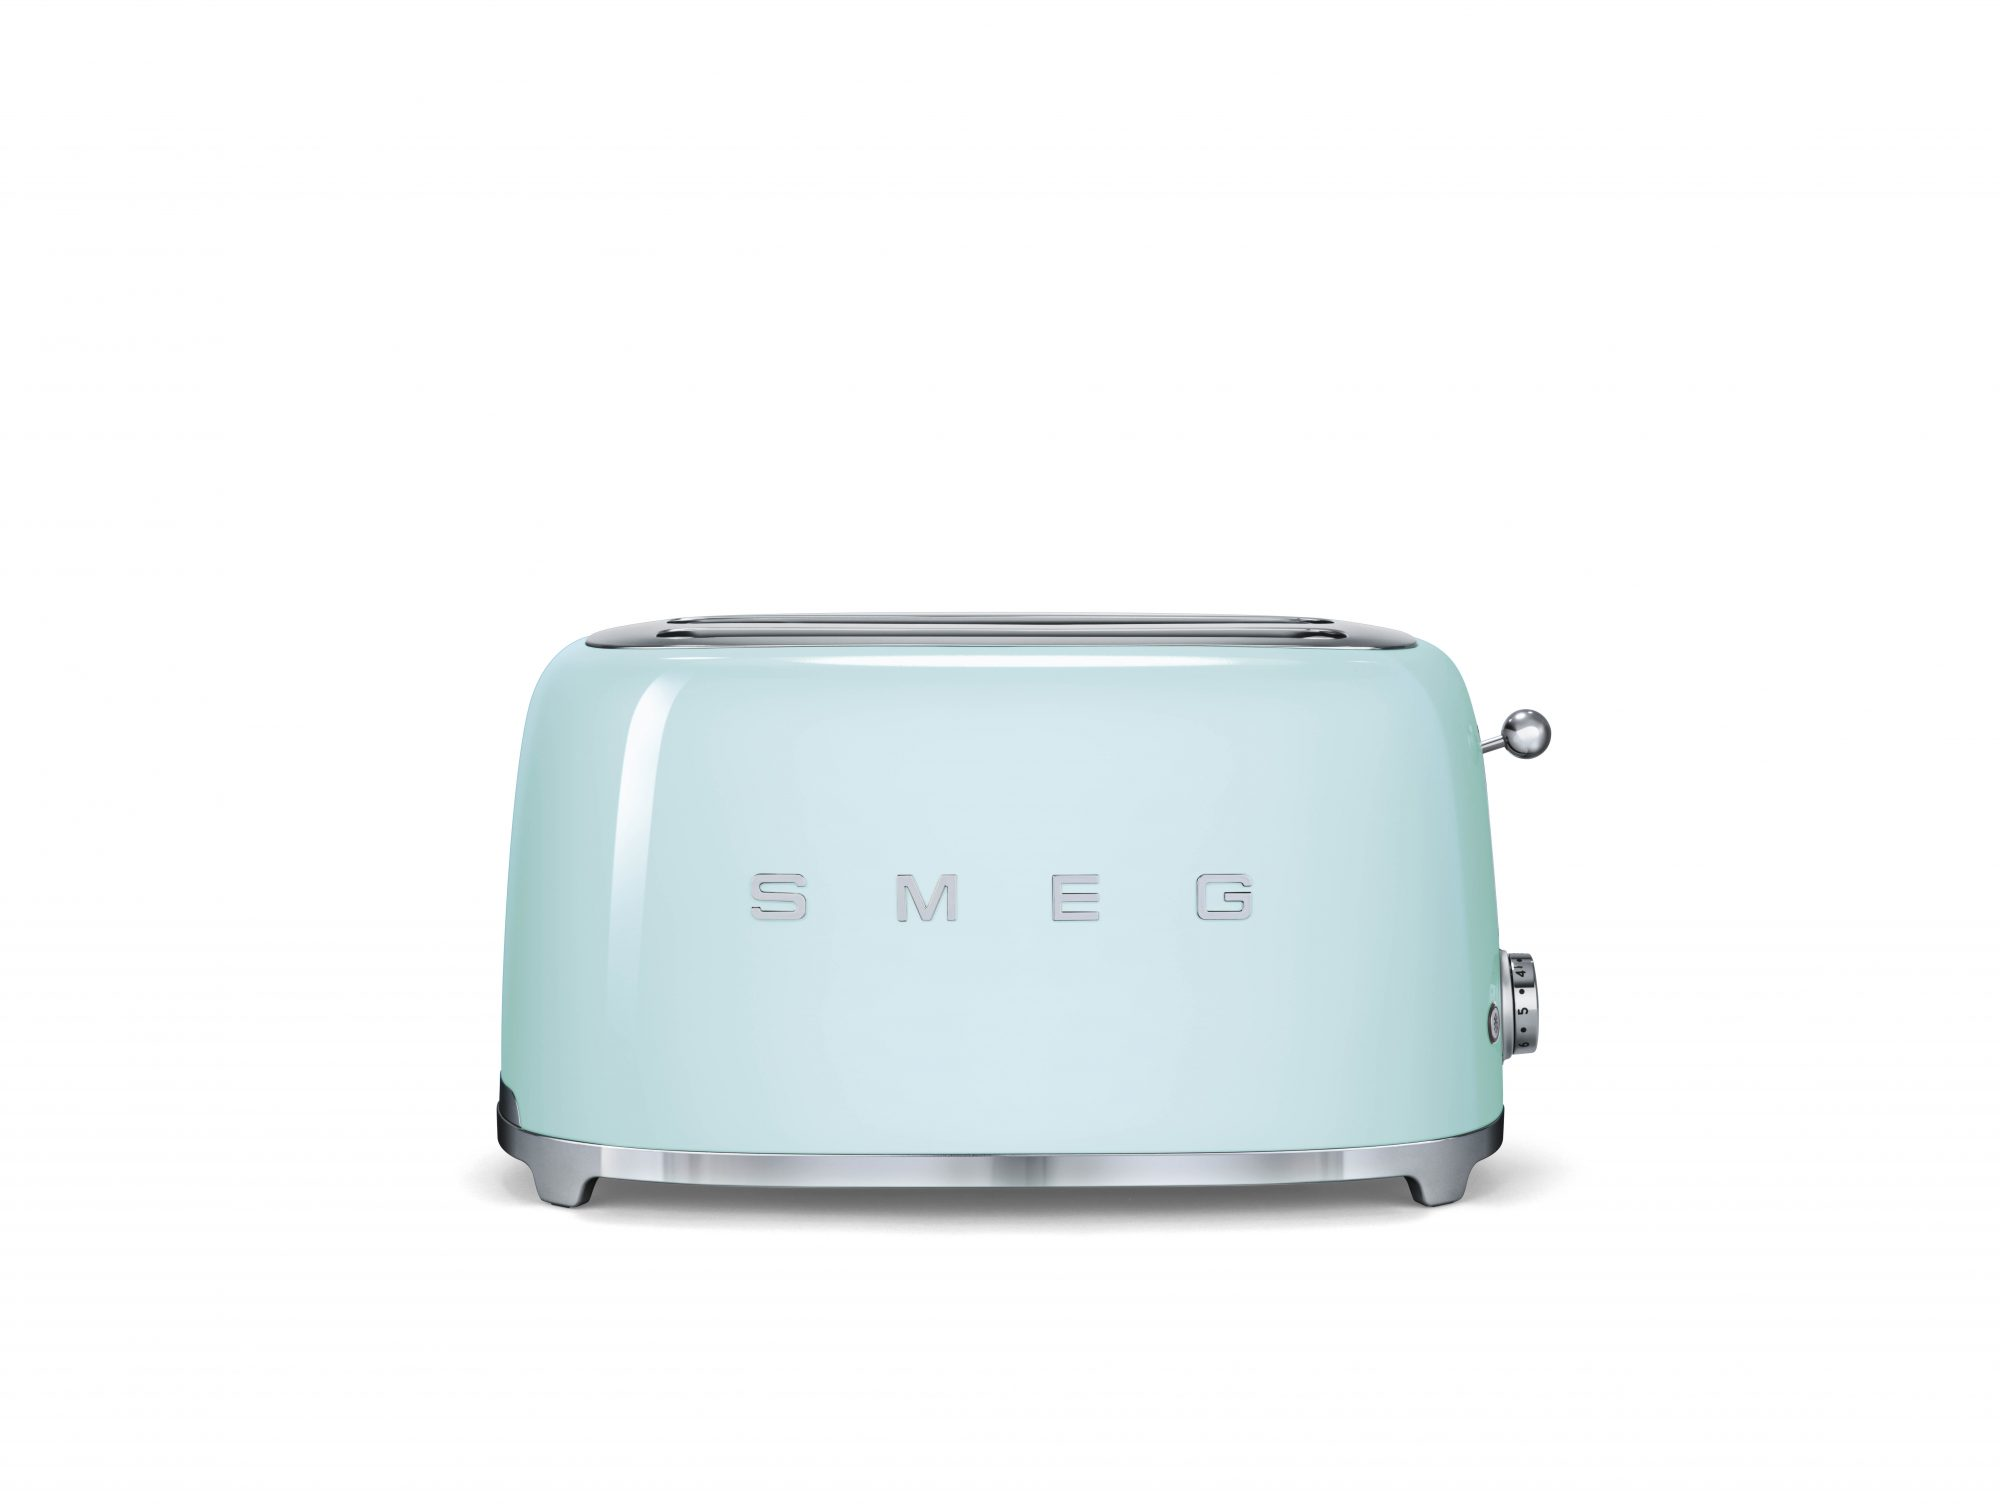 smeg-vintage-toaster-image